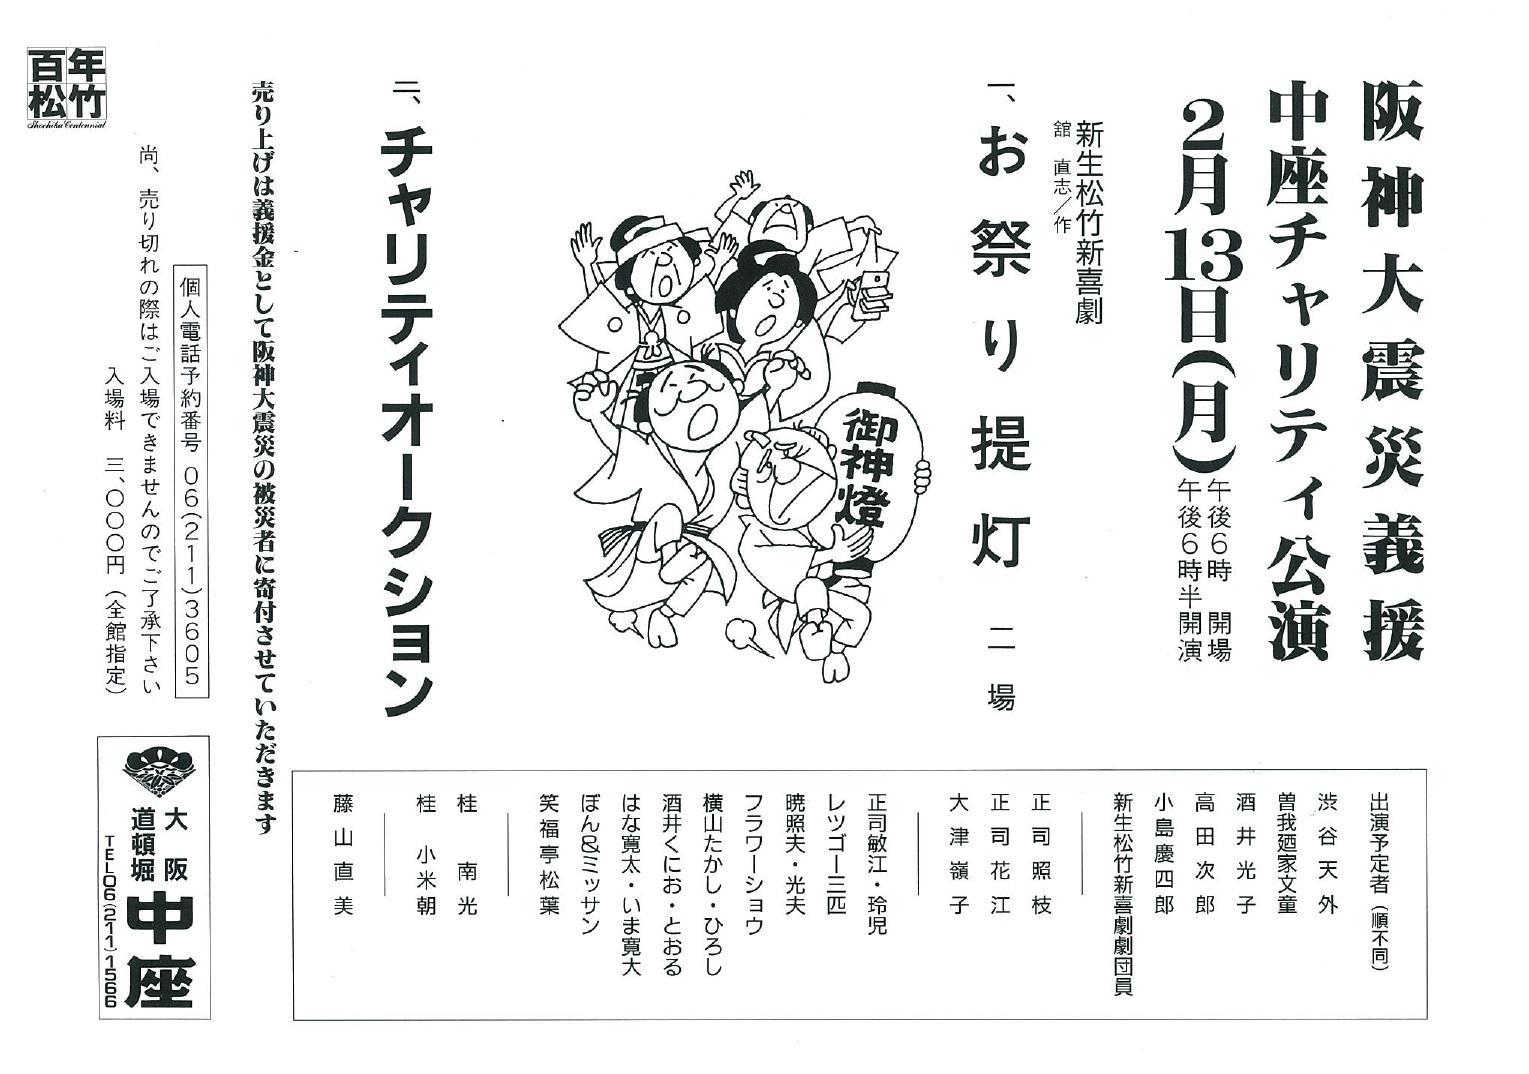 【中座】阪神大震災義援中座チャリティ公演